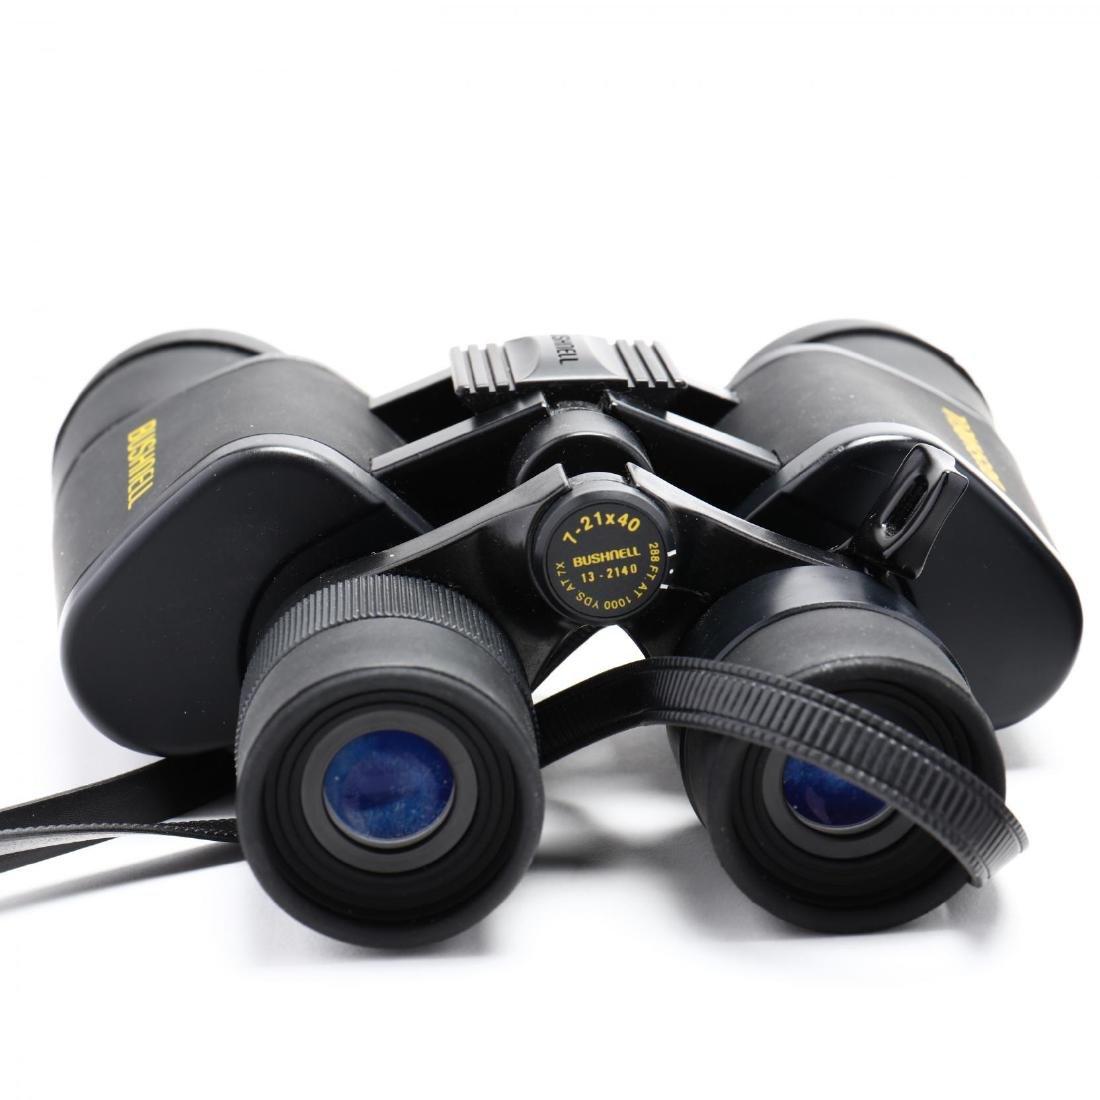 Two Pairs of Bushnell Binoculars - 4